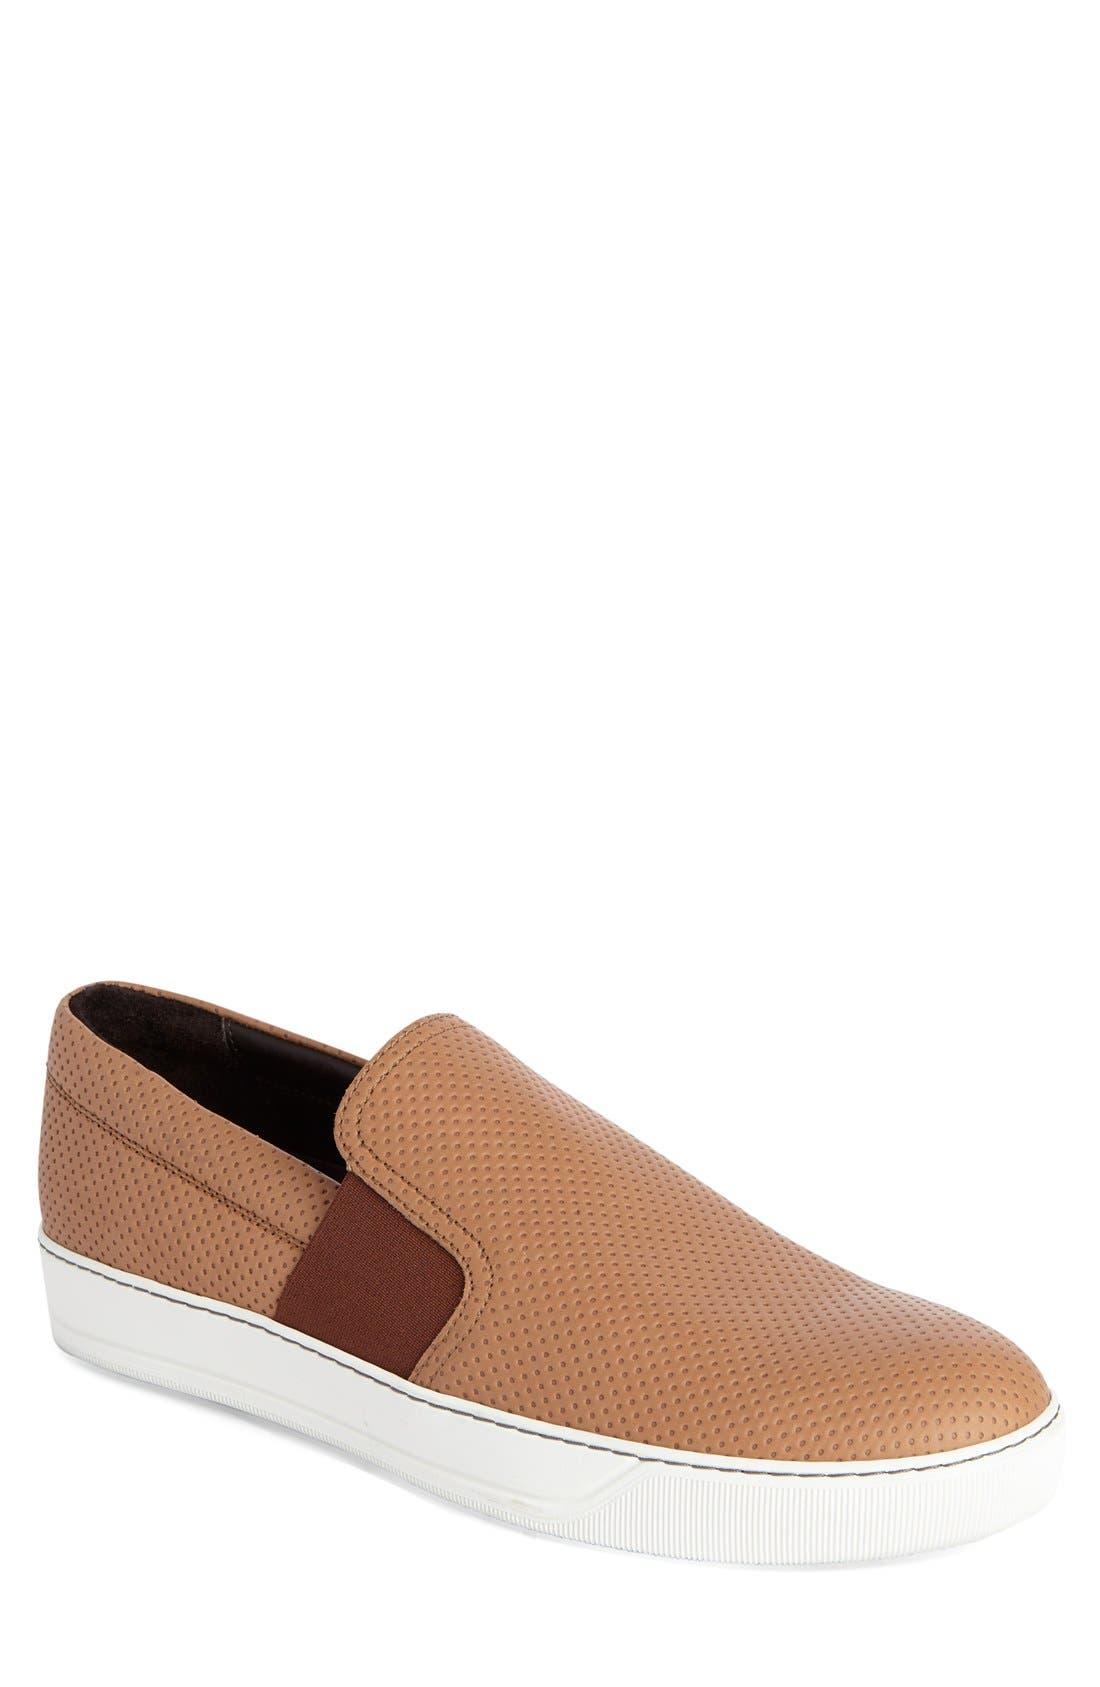 LANVIN Perforated Slip-On Sneaker